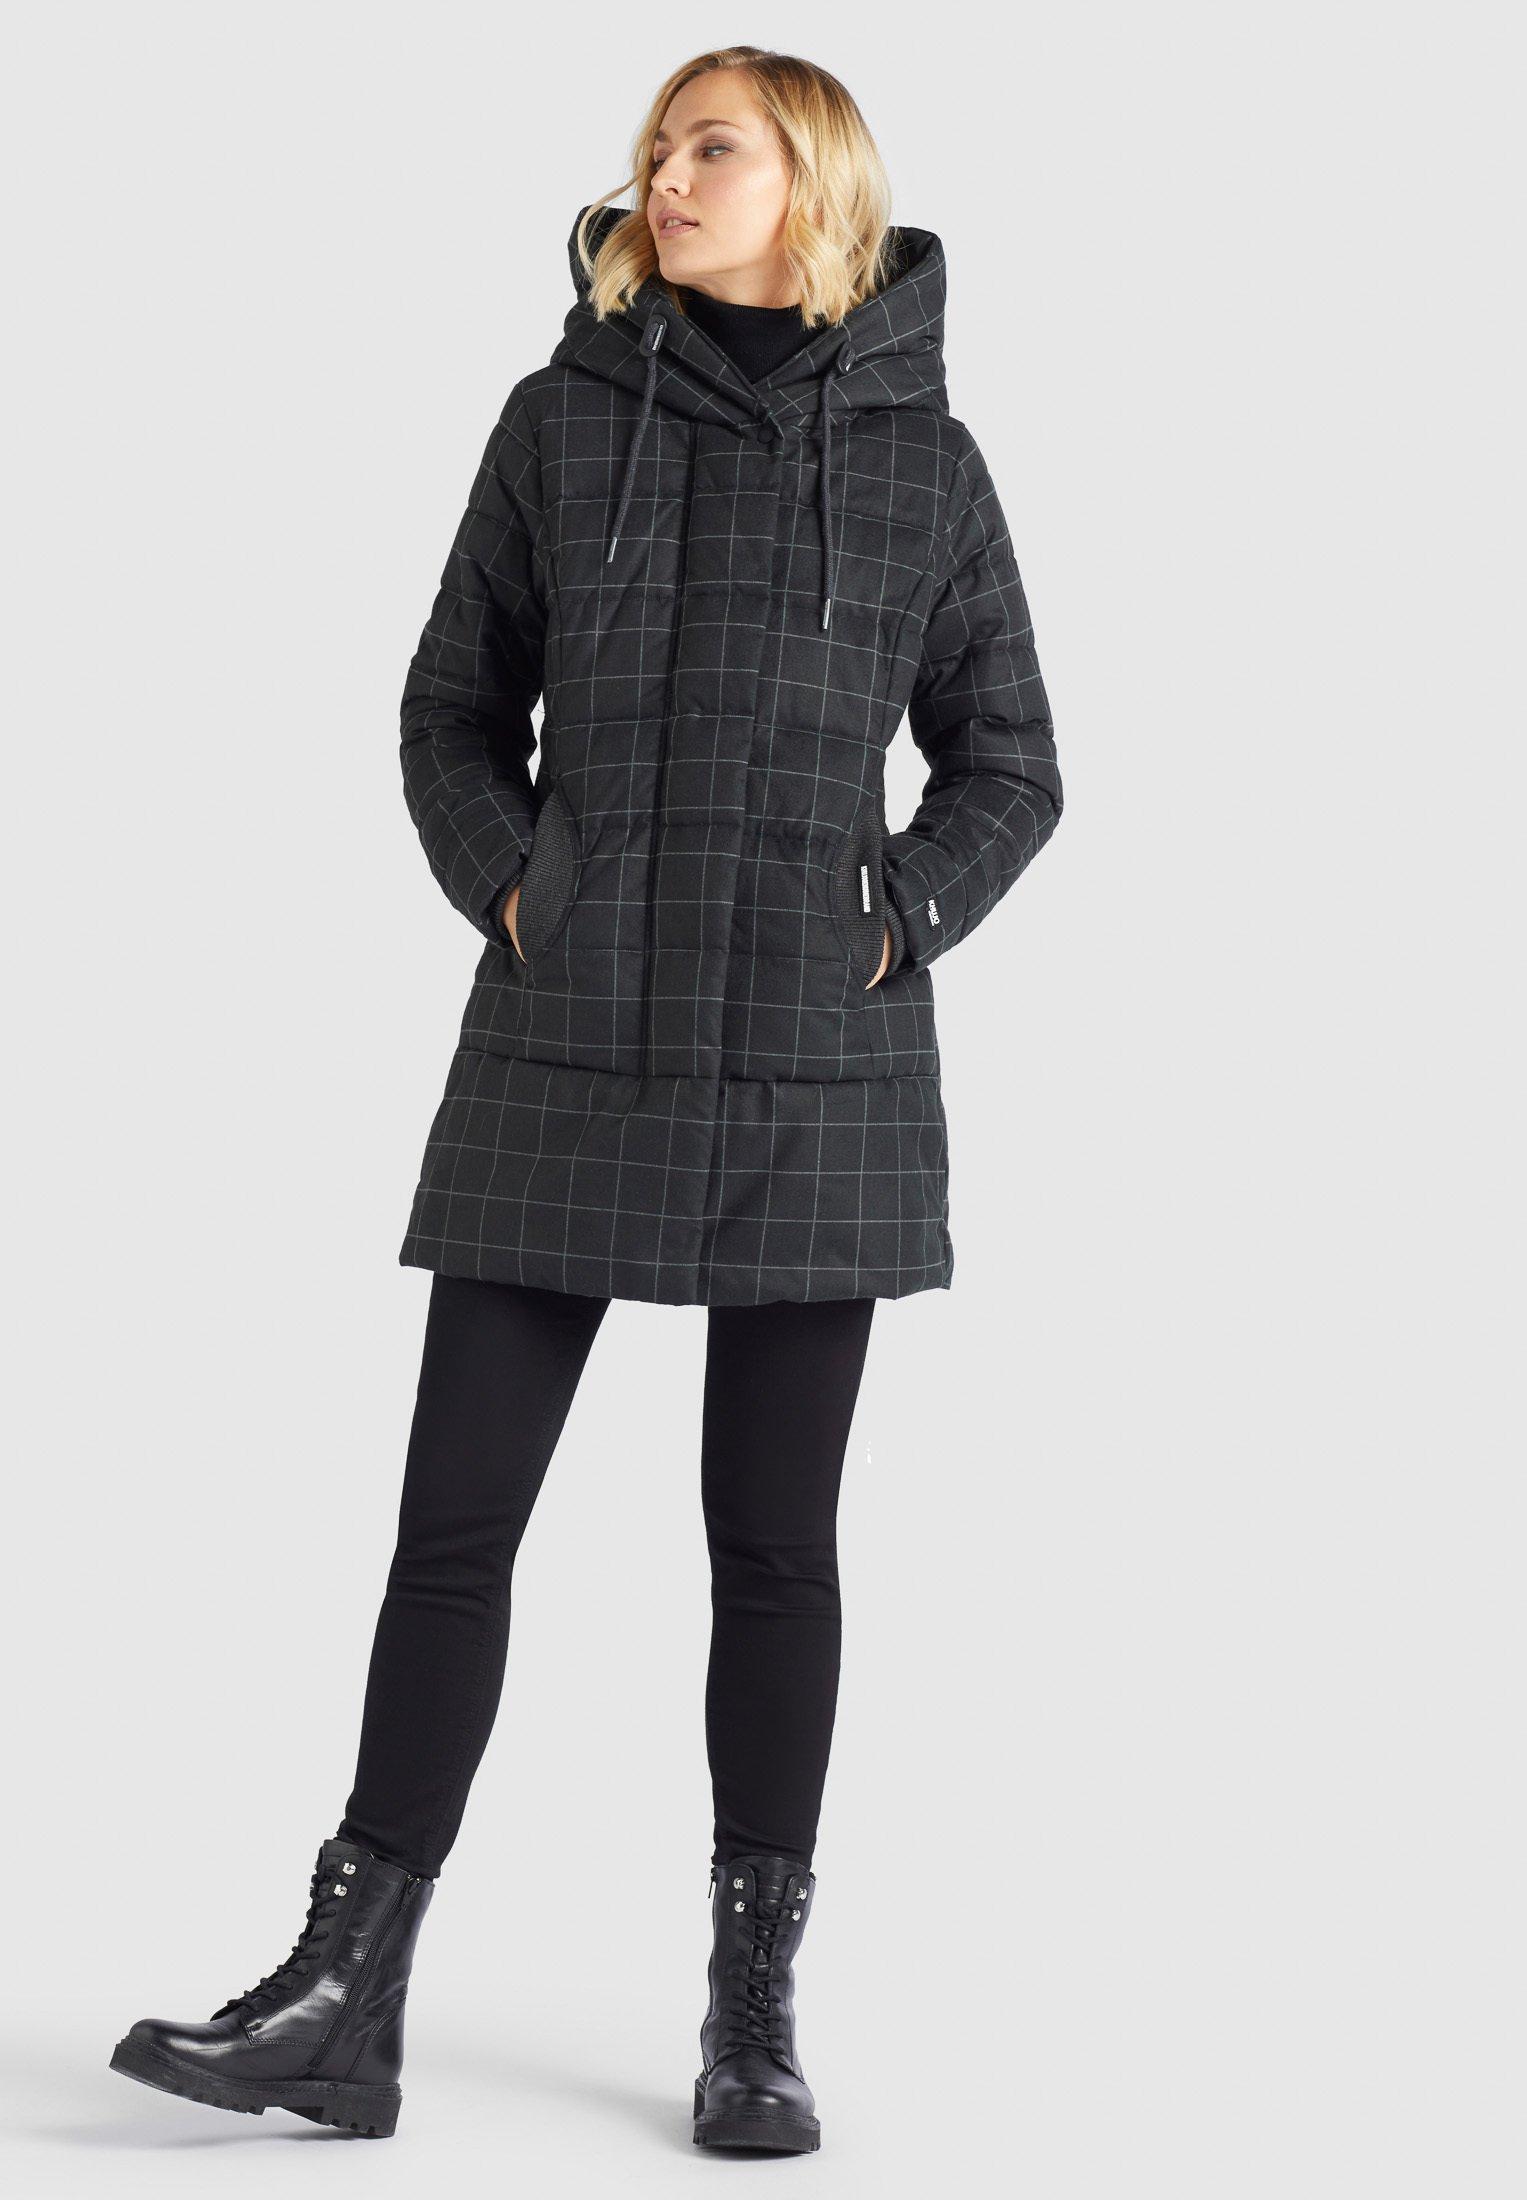 Damen SHERMA2 - Wintermantel